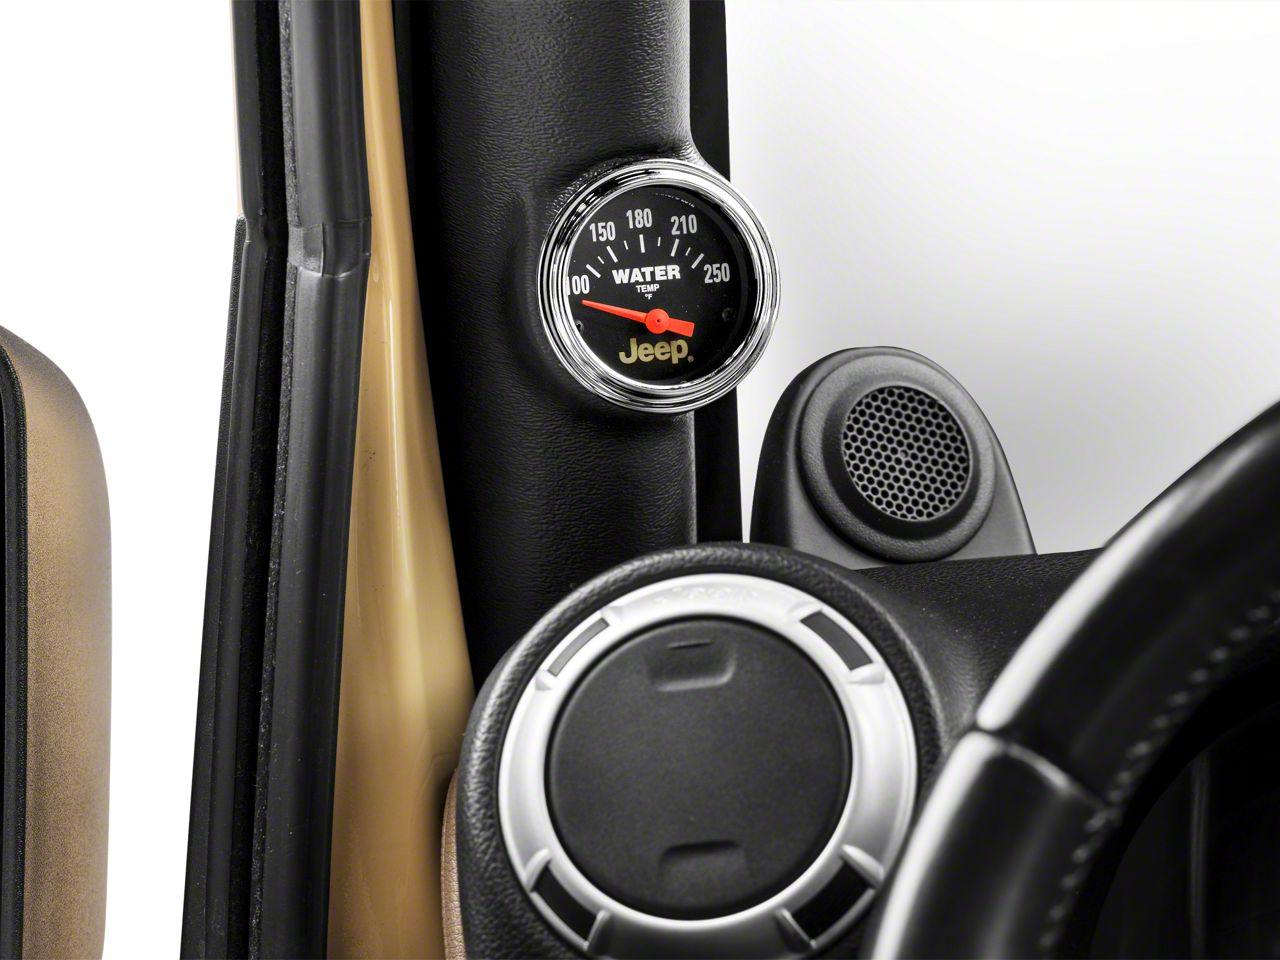 Auto Meter Water Temperature Gauge - Electrical - Jeep Logo (87-18 Jeep Wrangler YJ, TJ, JK & JL)